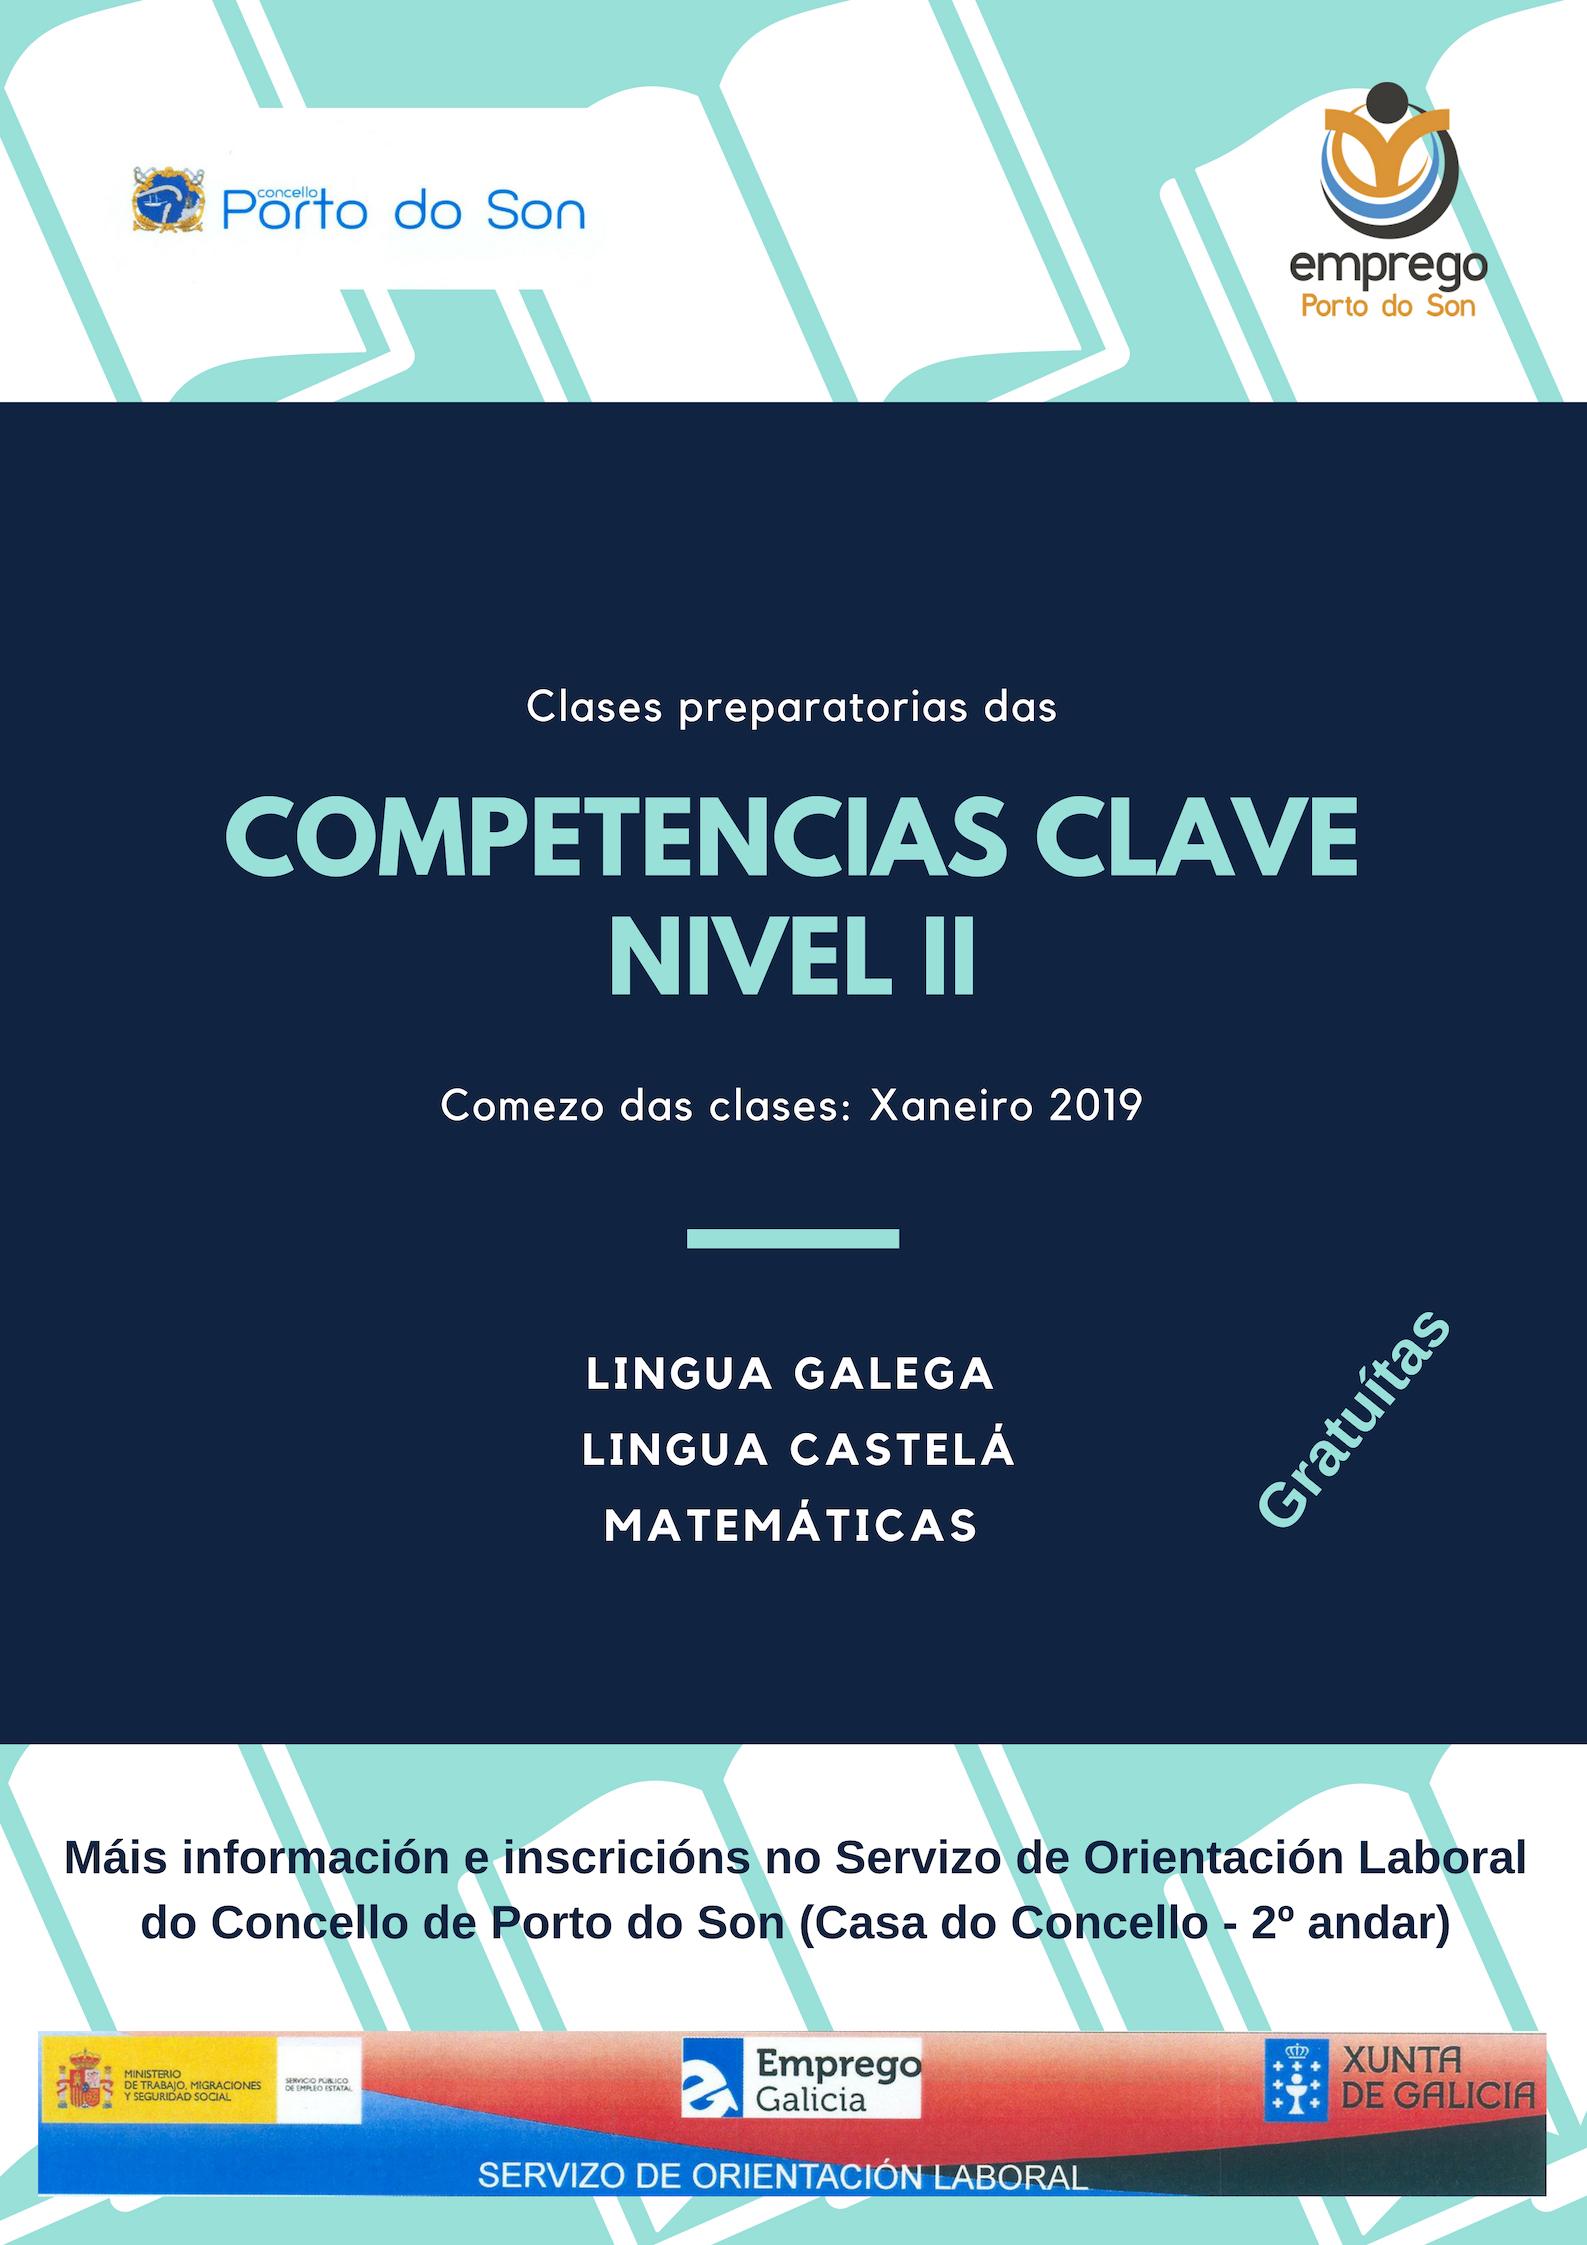 Cartel Competencias Clave (II) Porto do Son 2019